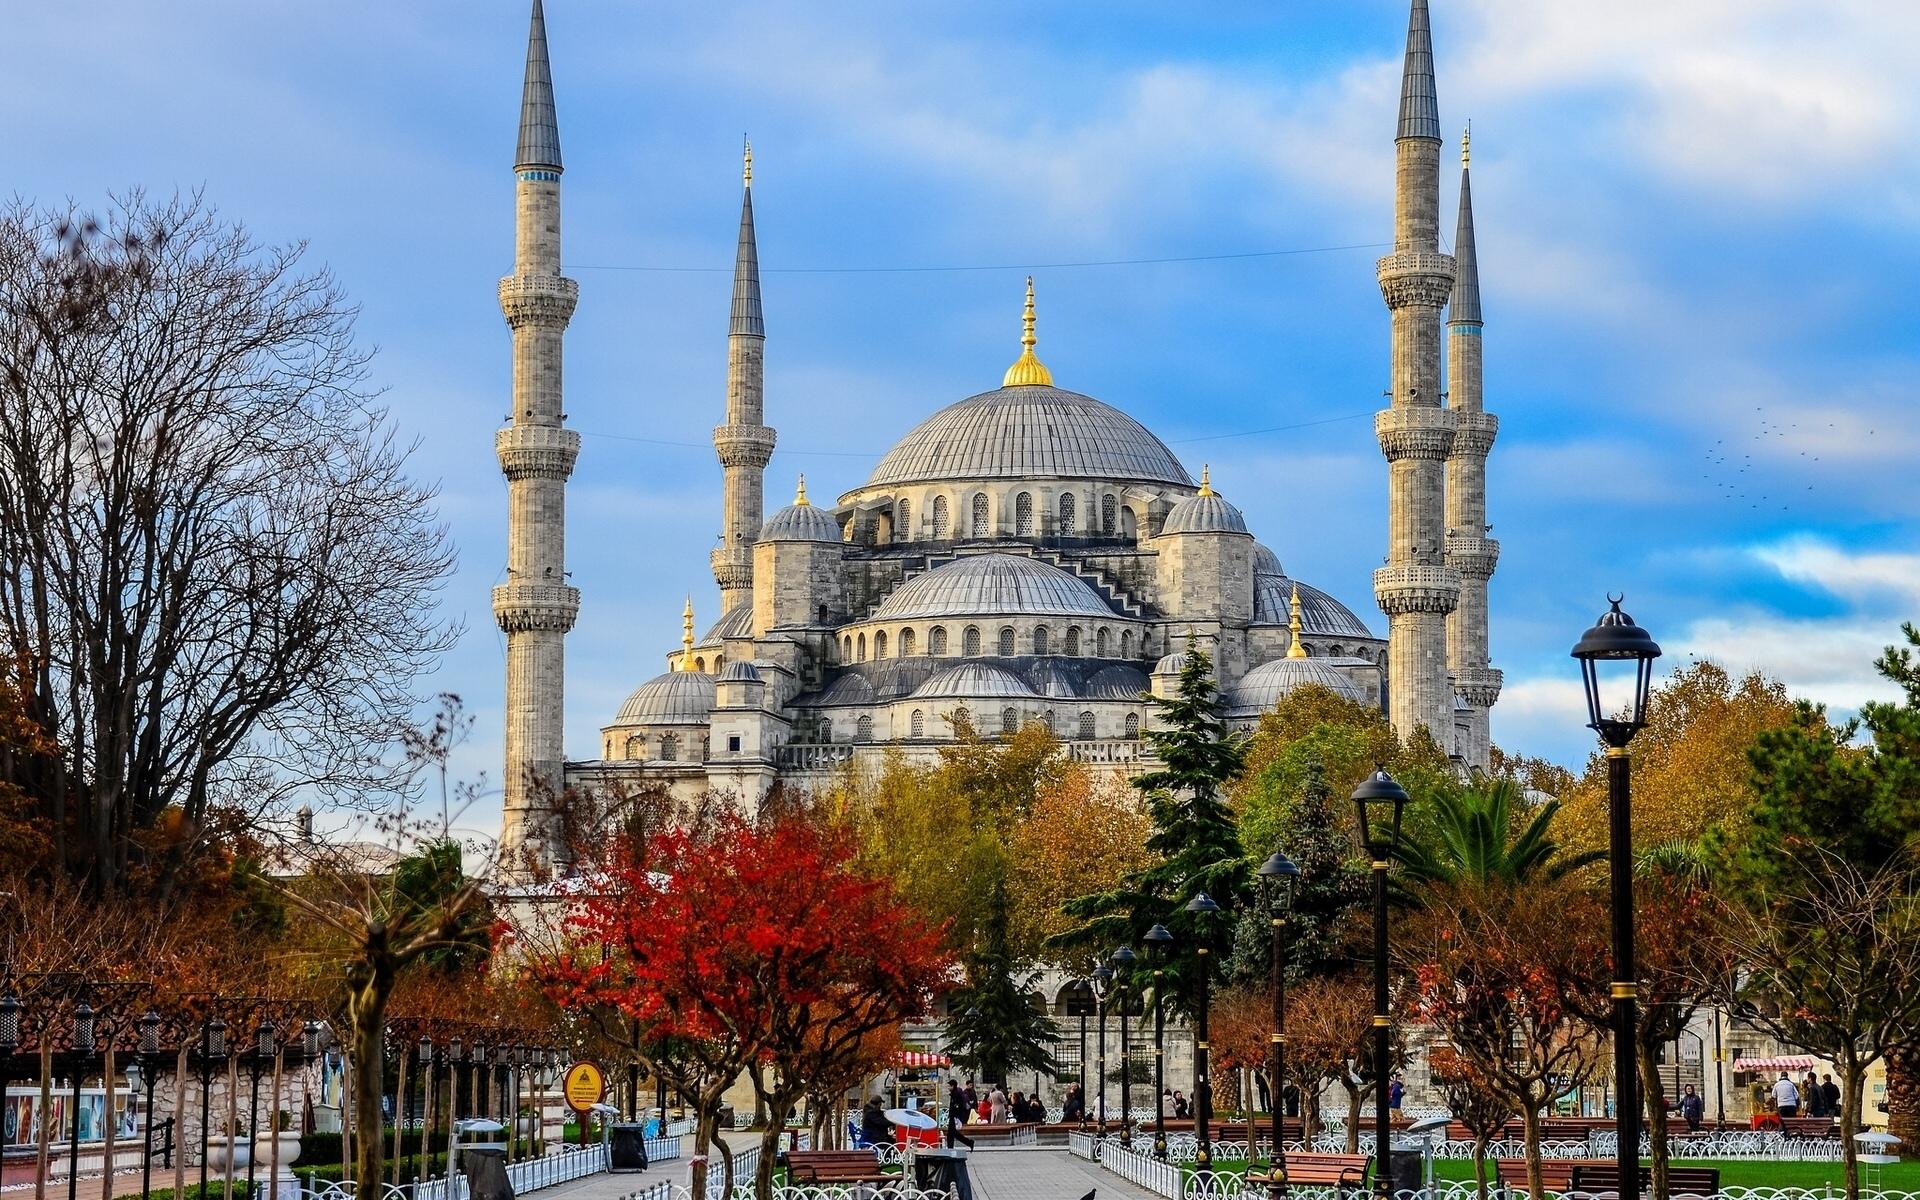 Istanbul in autumn - بهترین شهرهای اروپا برای سفر در پاییز (قسمت ۲) | Europe